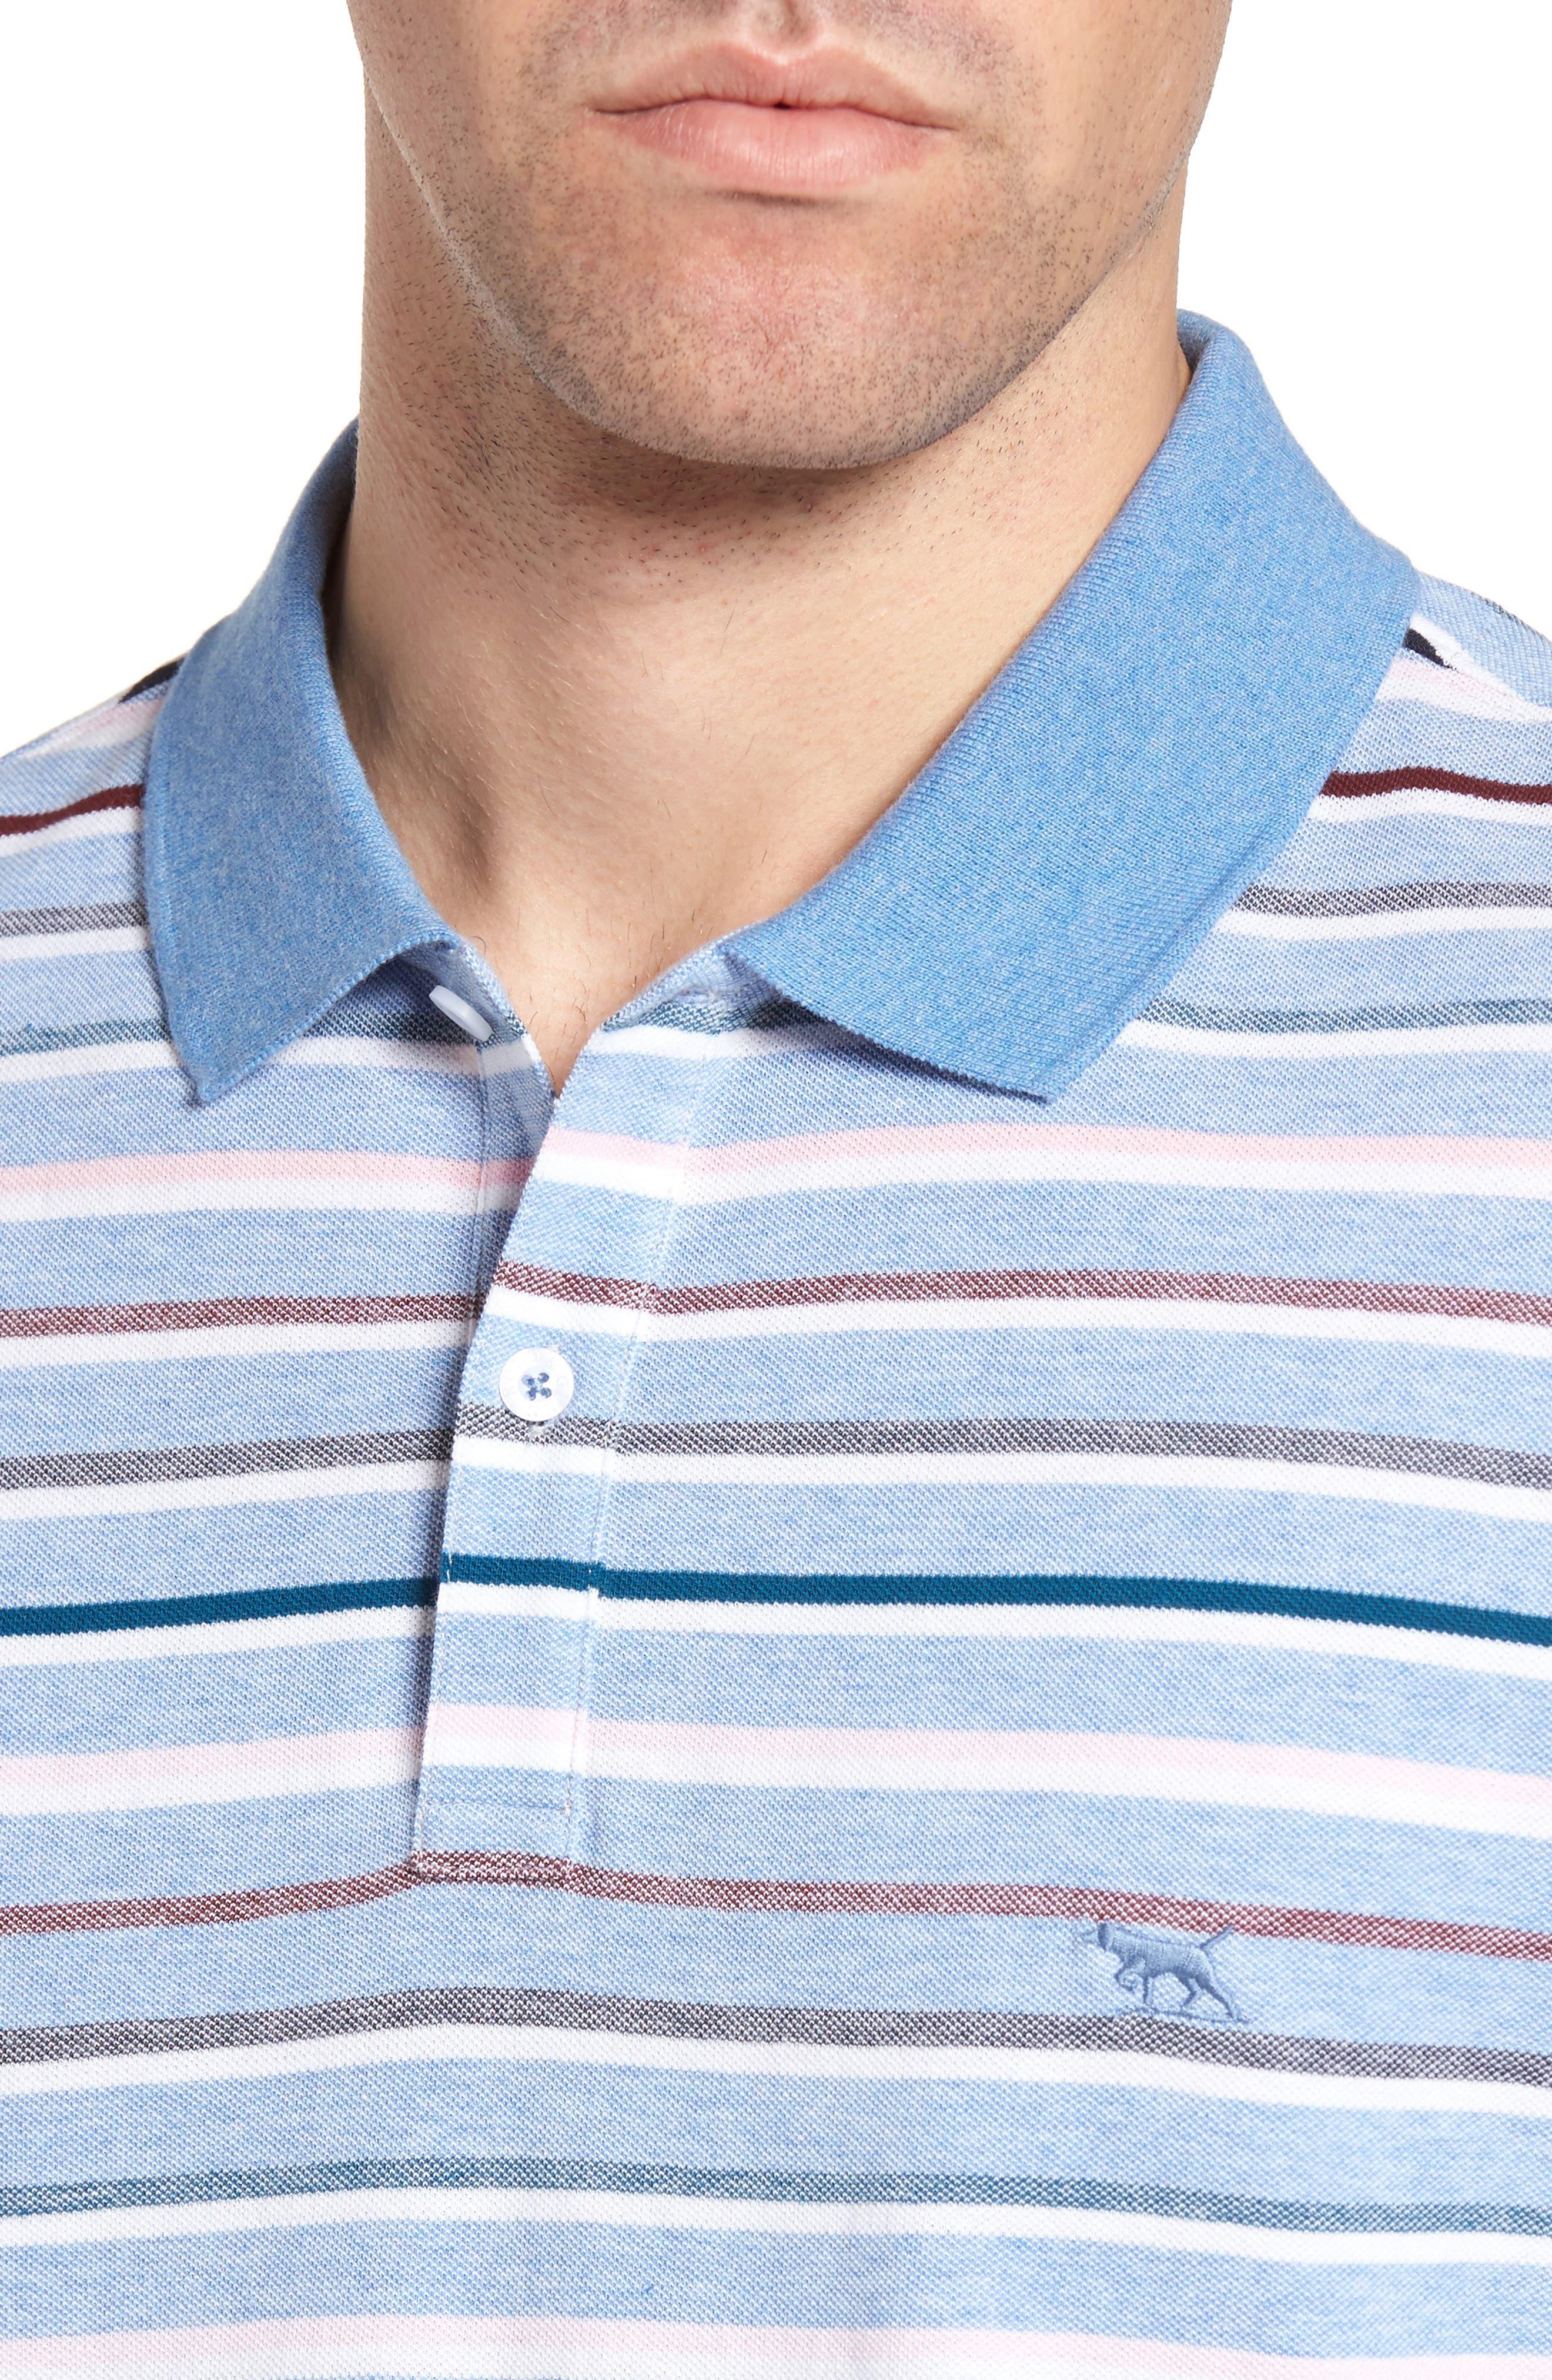 Gowan Hill Sports Fit Cotton Polo,                             Alternate thumbnail 4, color,                             457